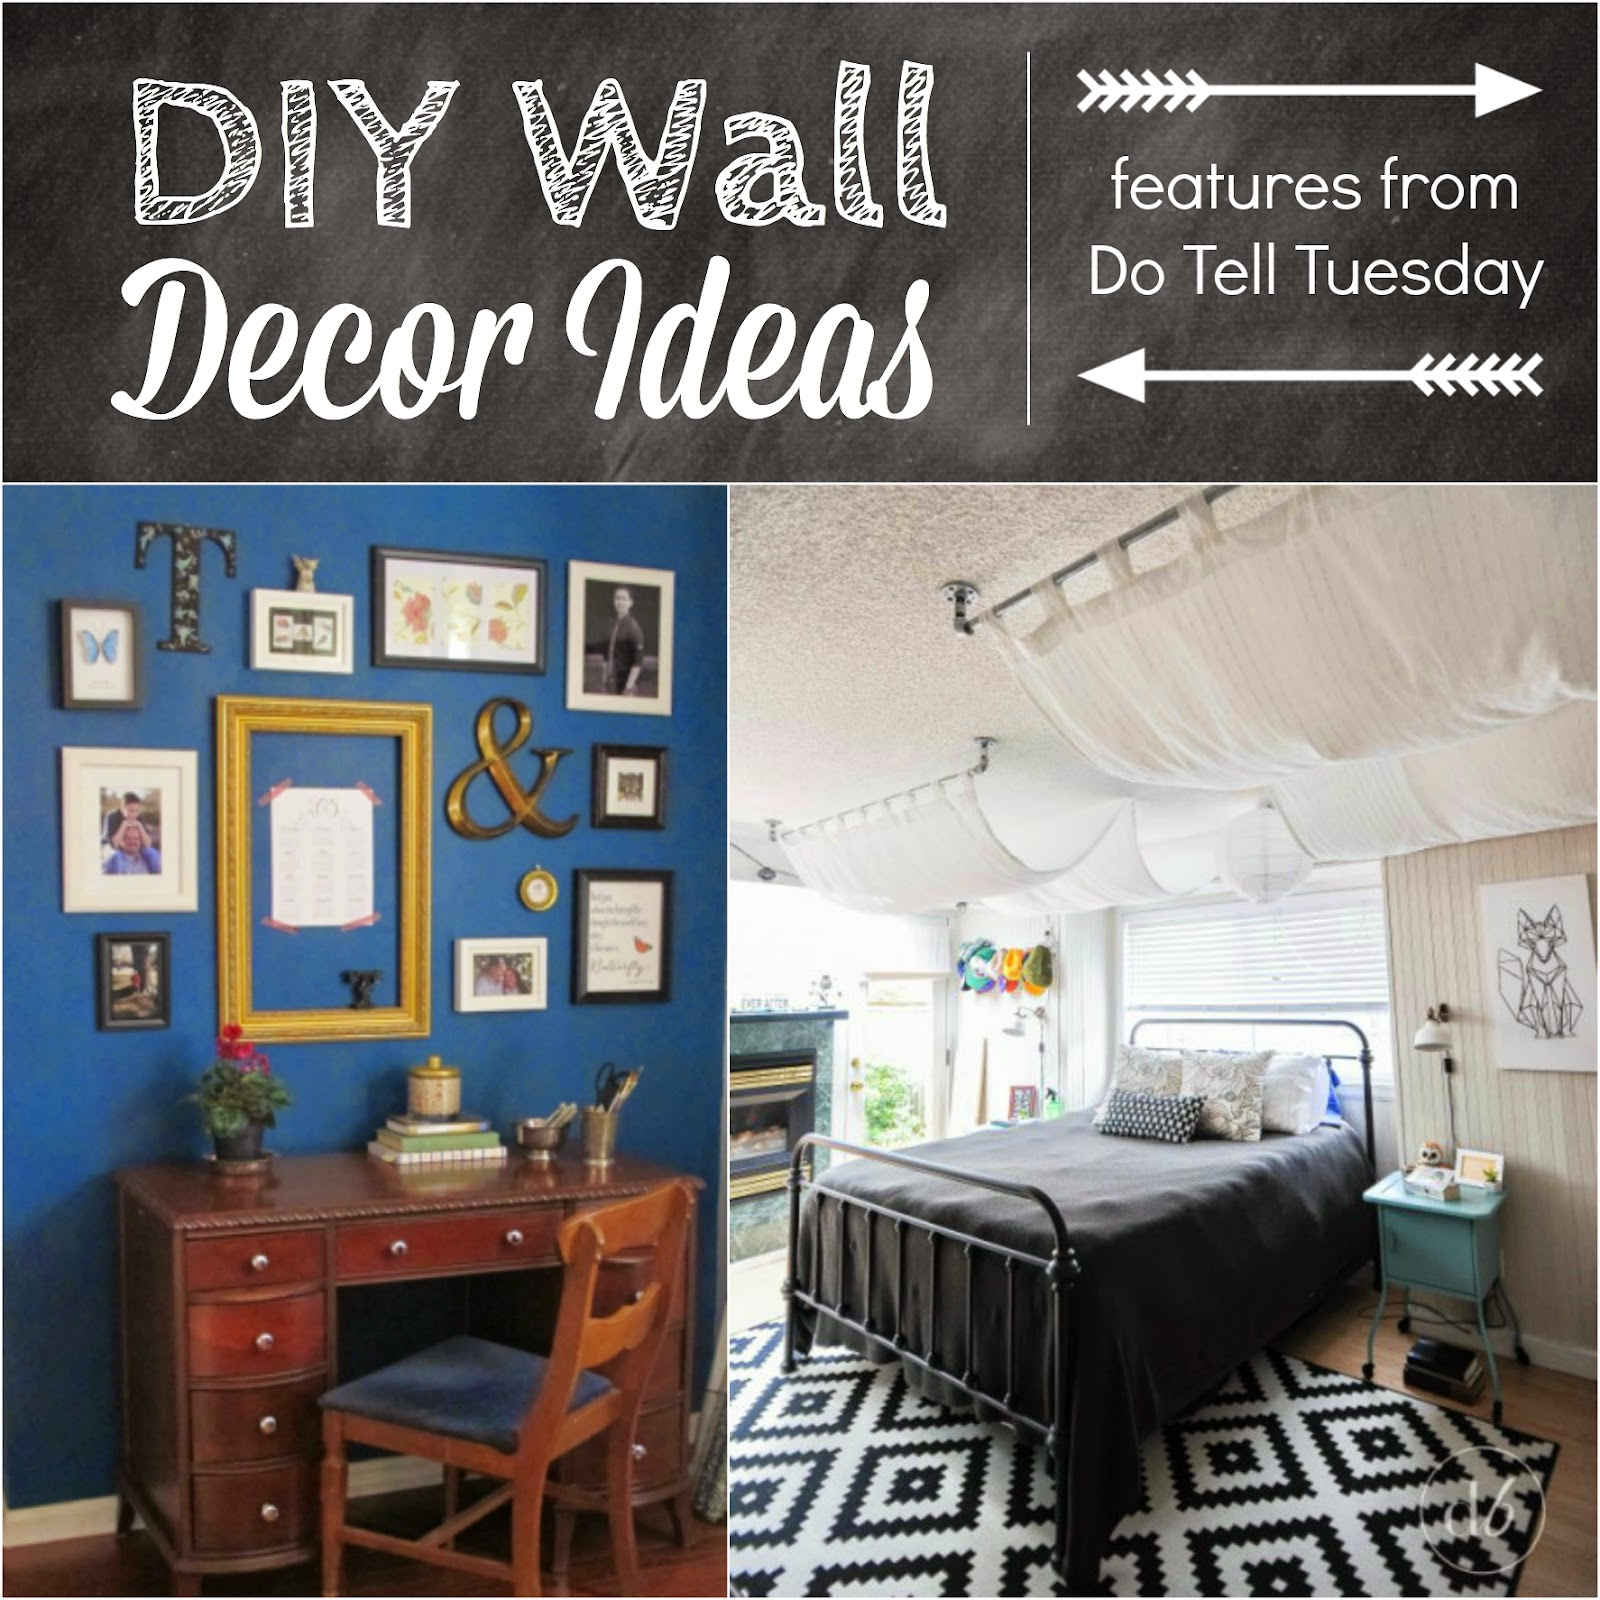 DIY Wall Decor Ideas & Do Tell Tuesday #62! ~ Diane's ...